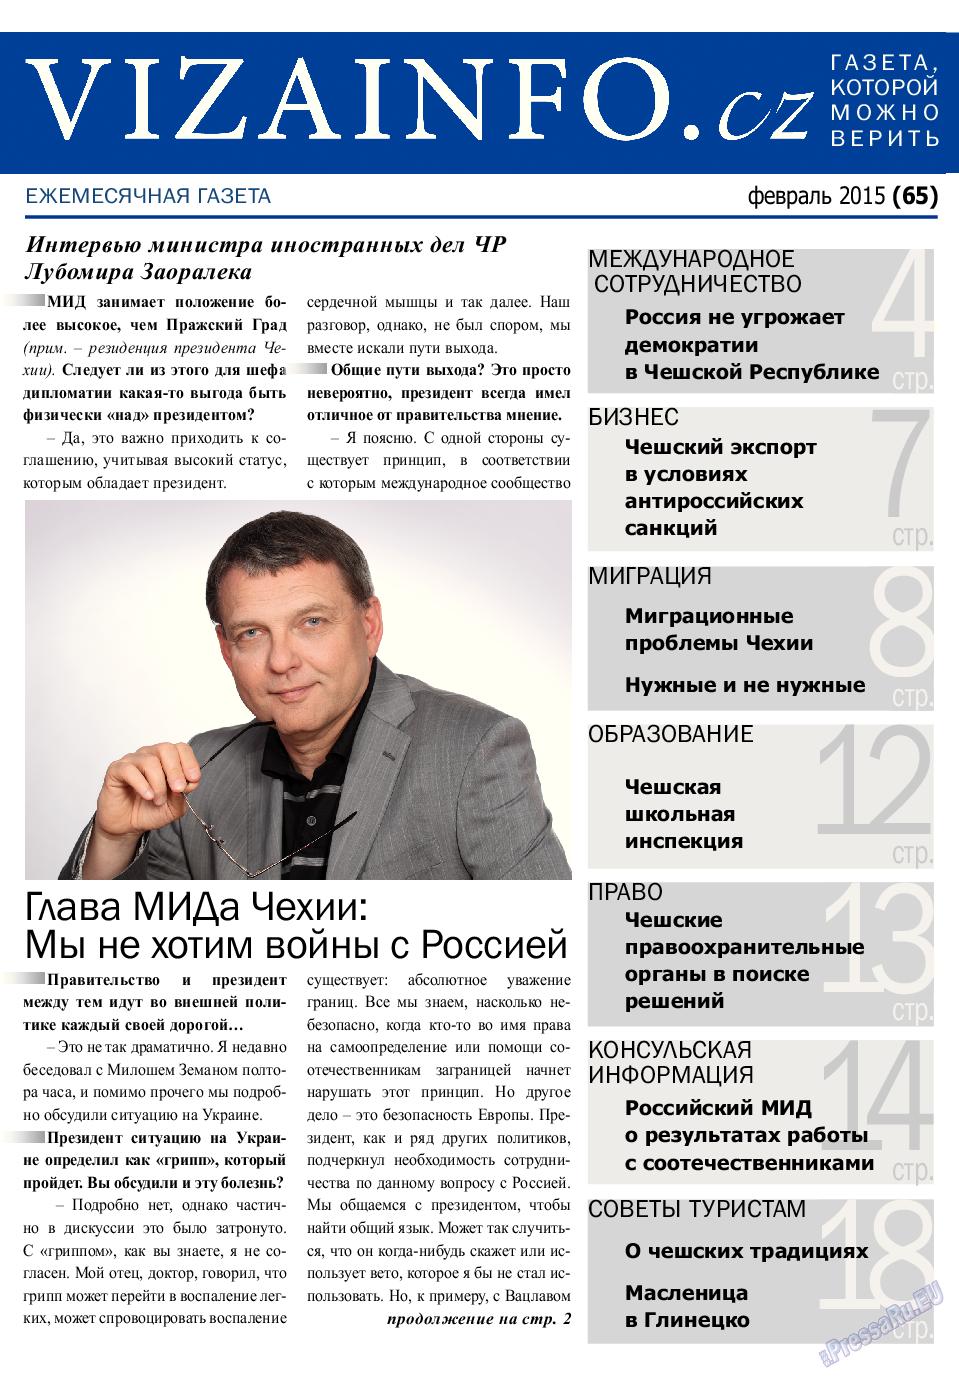 Vizainfo.cz (газета). 2015 год, номер 65, стр. 1